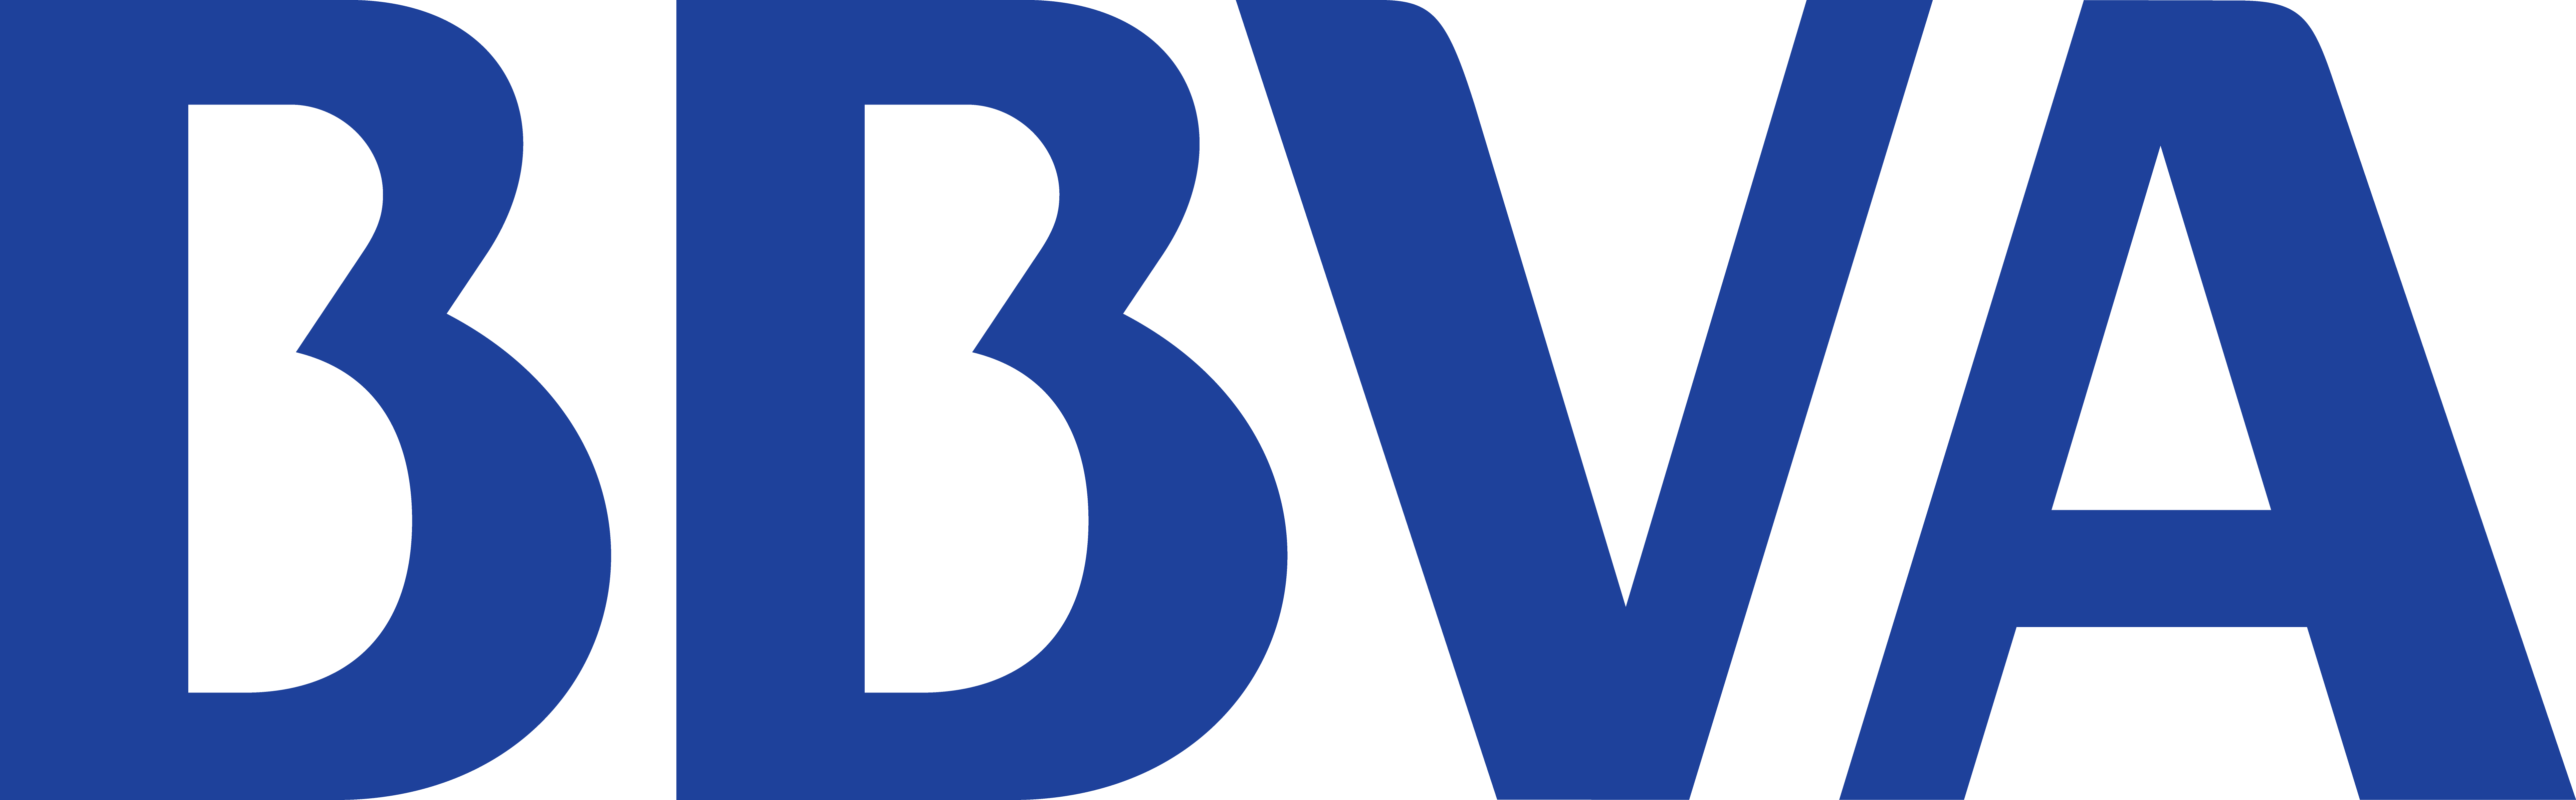 About BBVA